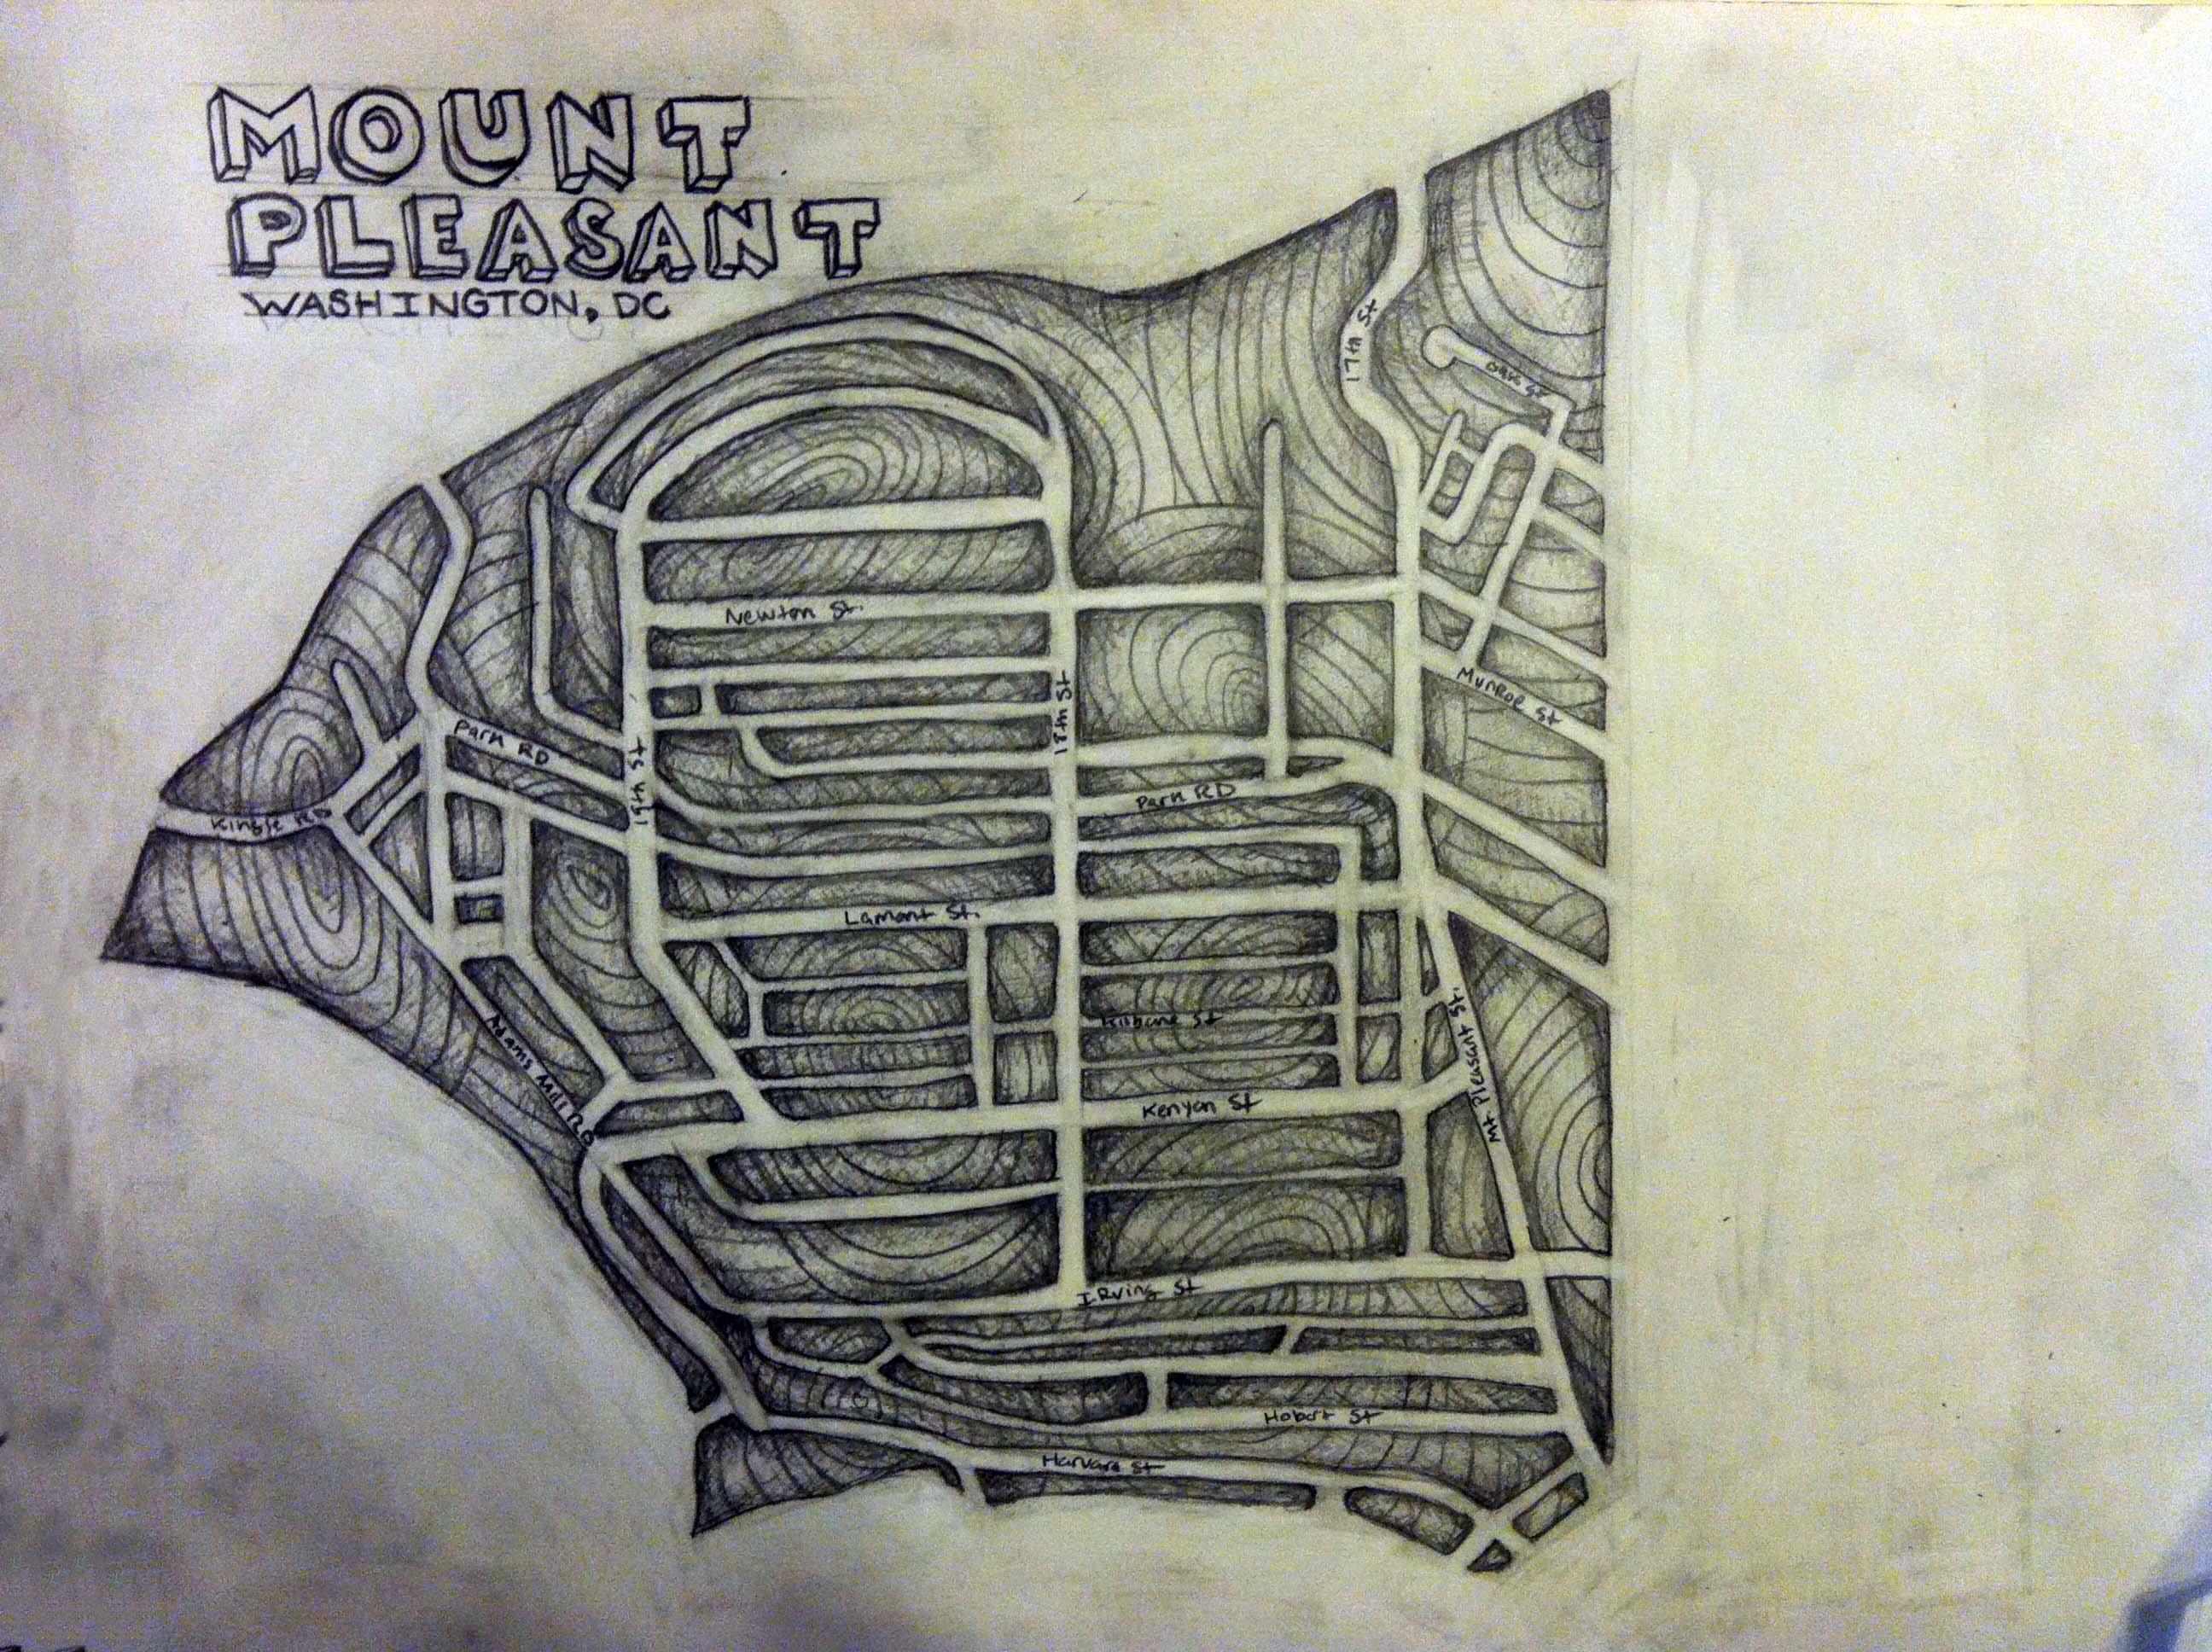 Mt. Pleasant - image 1 - student project